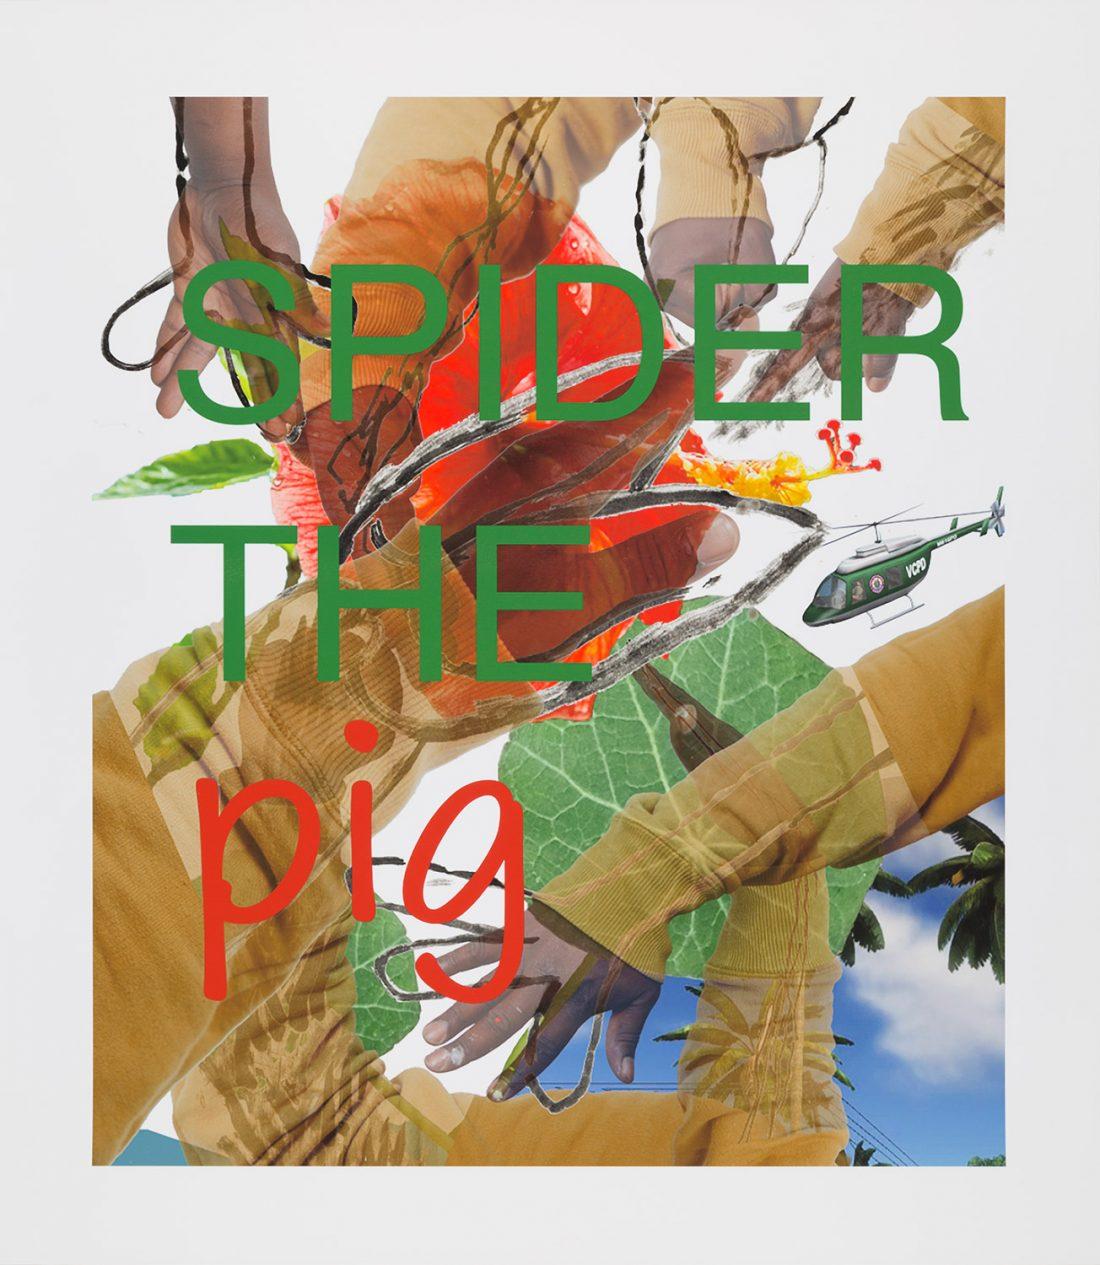 <p>Alvaro Barrington, &#8216;Spider the Pig, Pig the Spider&#8217;, 2021. Photo: David Harrison.</p>